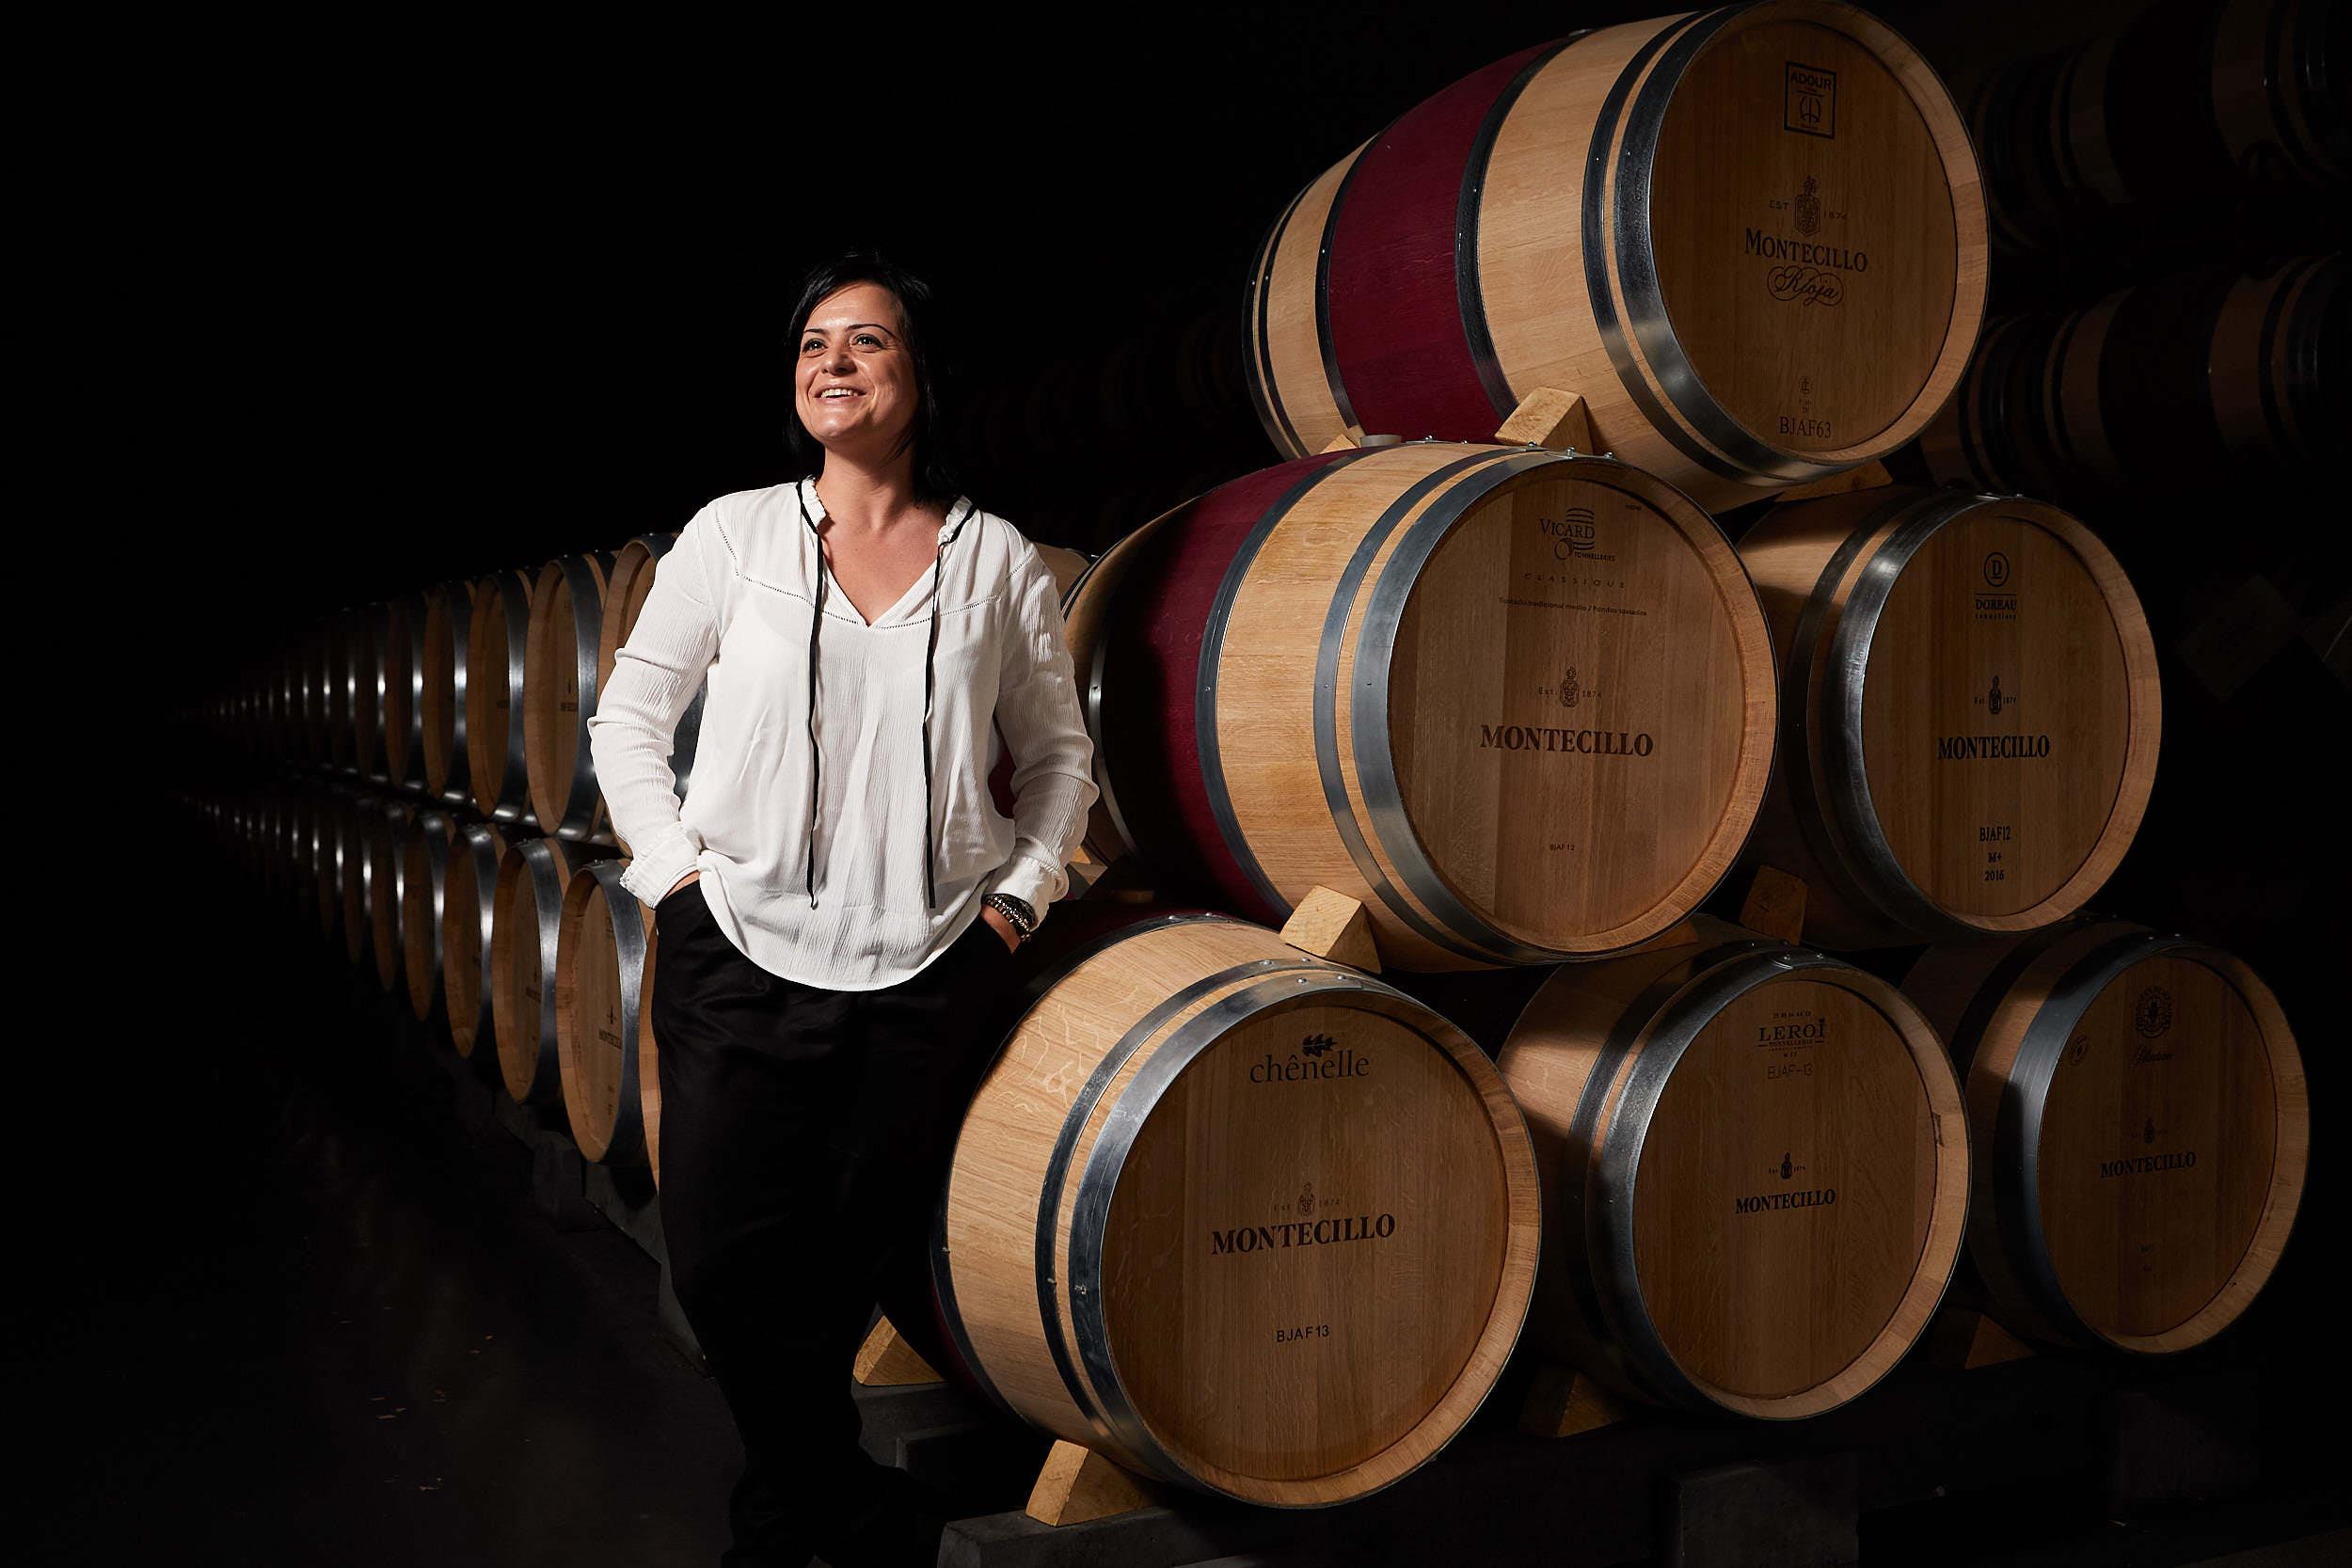 1612Bodegas_Montecillo_Wine_Photography_La_Rioja_Spain_James_Sturcke_sturcke.org_0007.jpg